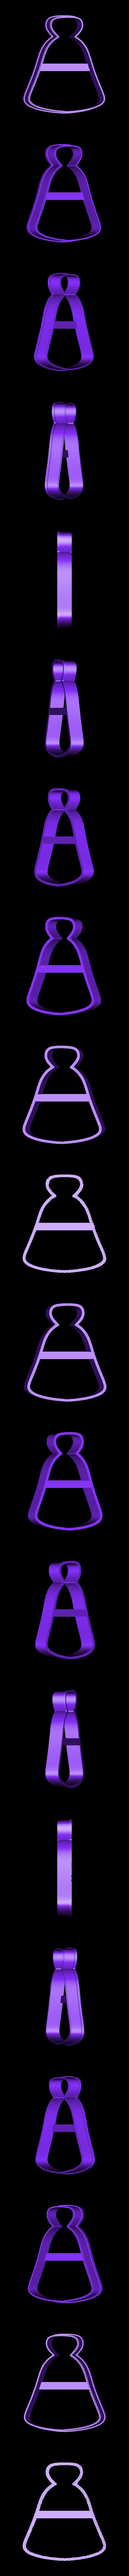 00974 butilochka zelie.stl Download OBJ file Bottle Potion cookie cutter for professional • 3D printer object, gleblubin